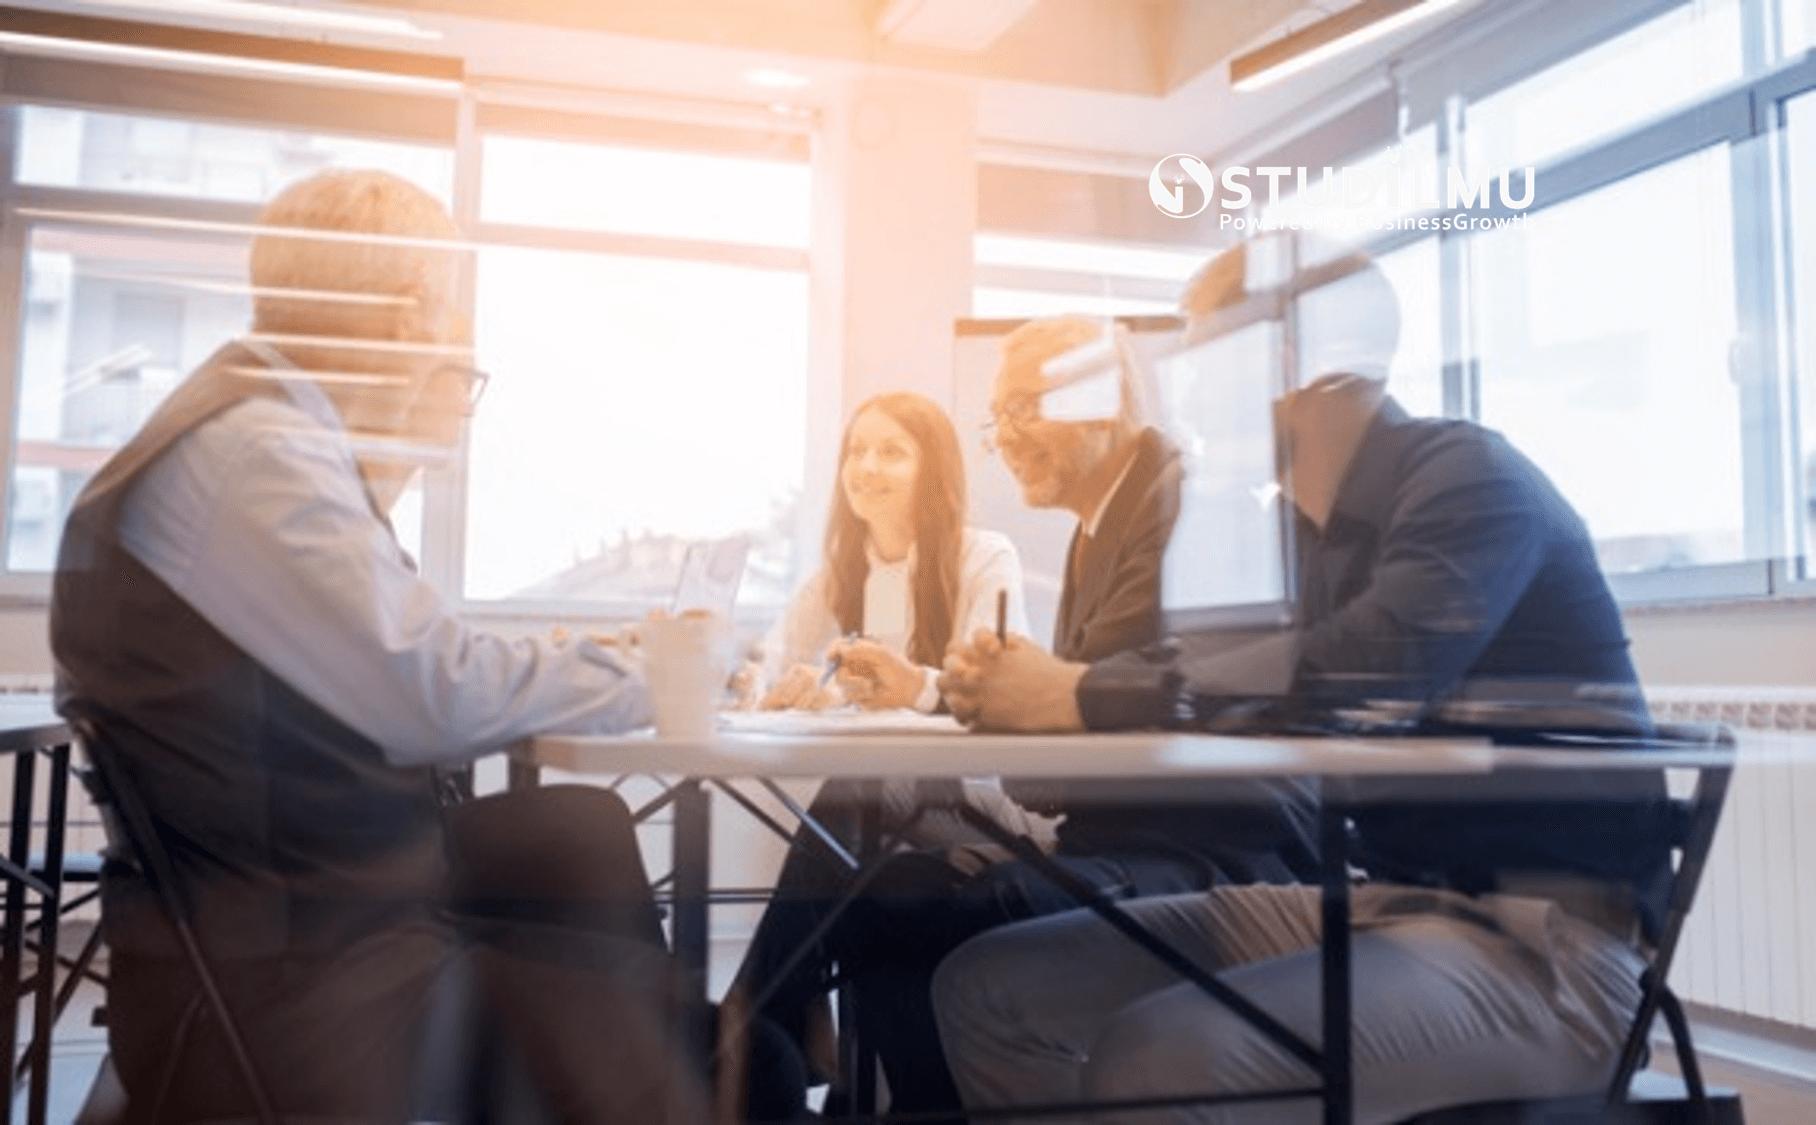 STUDILMU Career Advice - Rapat Kerja dengan Komunikasi yang Efektif